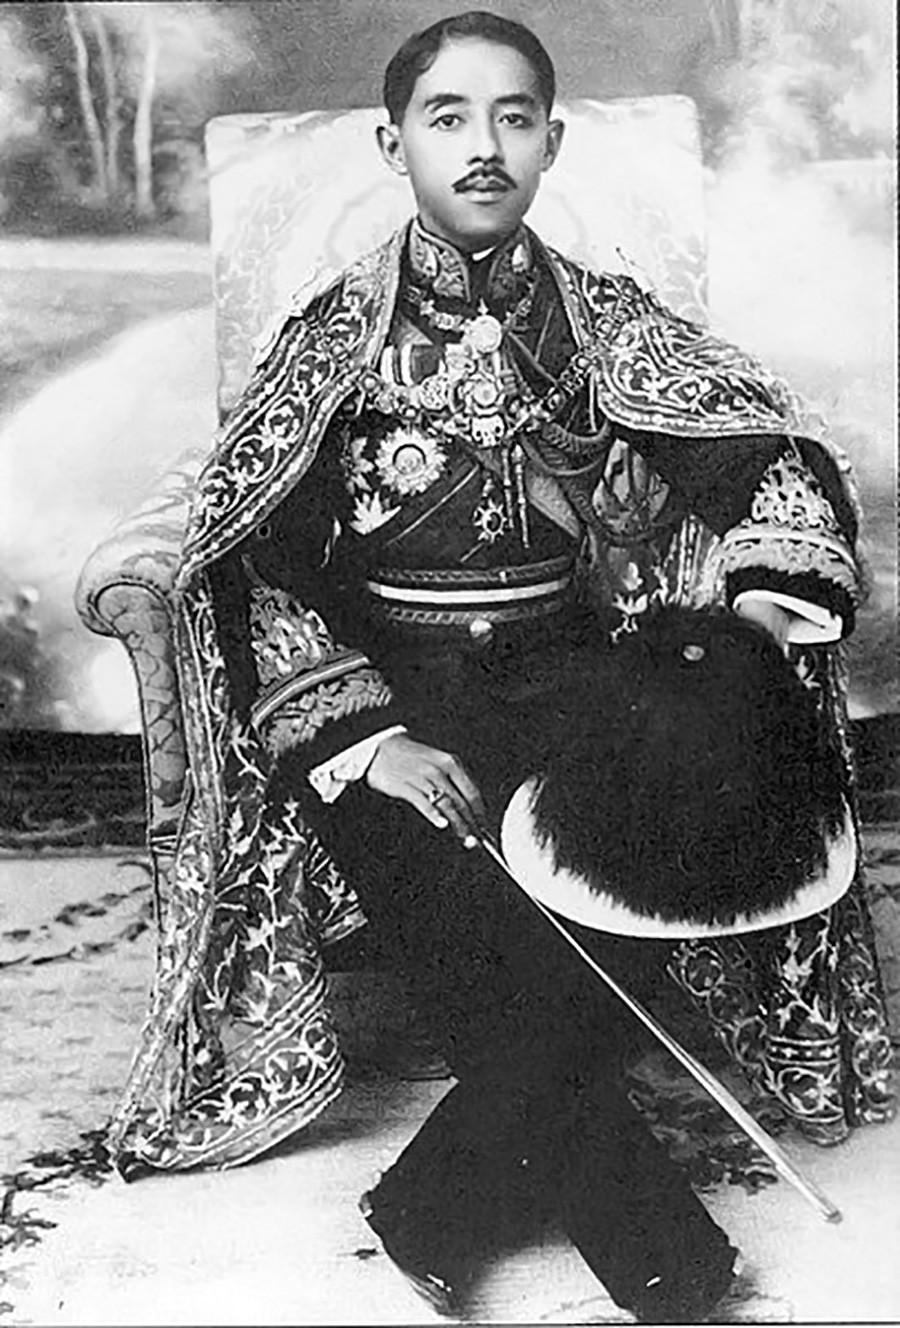 Prince Chakrabongse Bhuvanadh